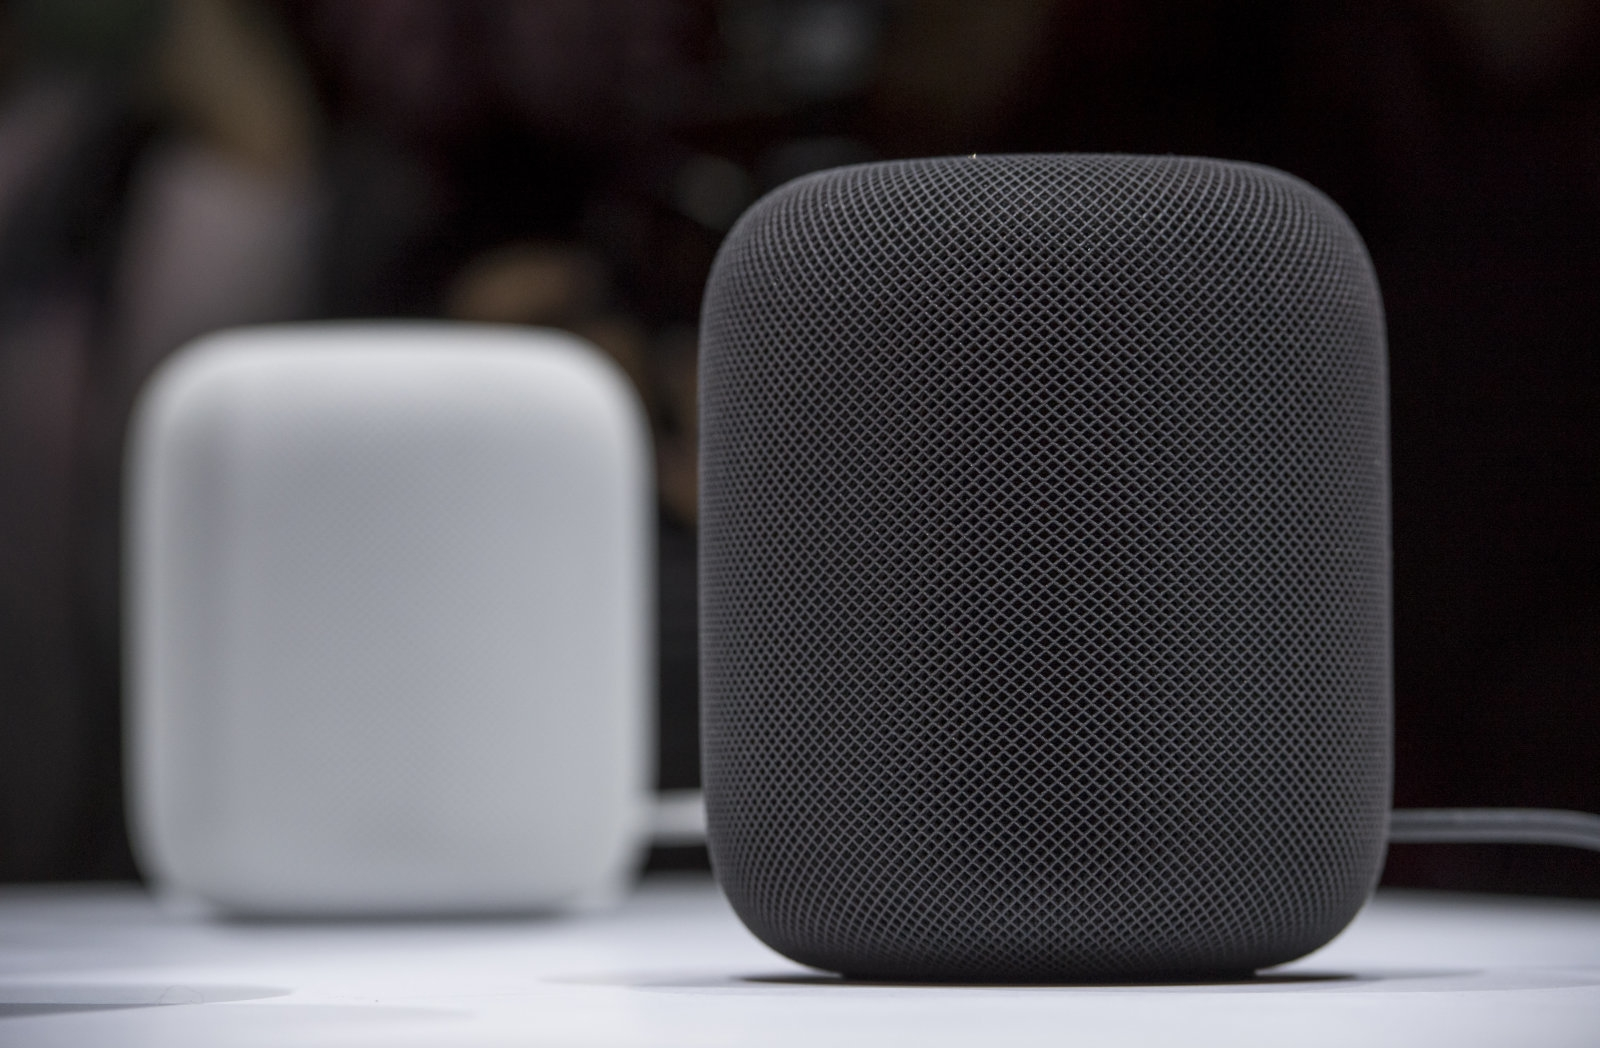 Apple's HomePod speaker needs an iOS device to work | DeviceDaily.com